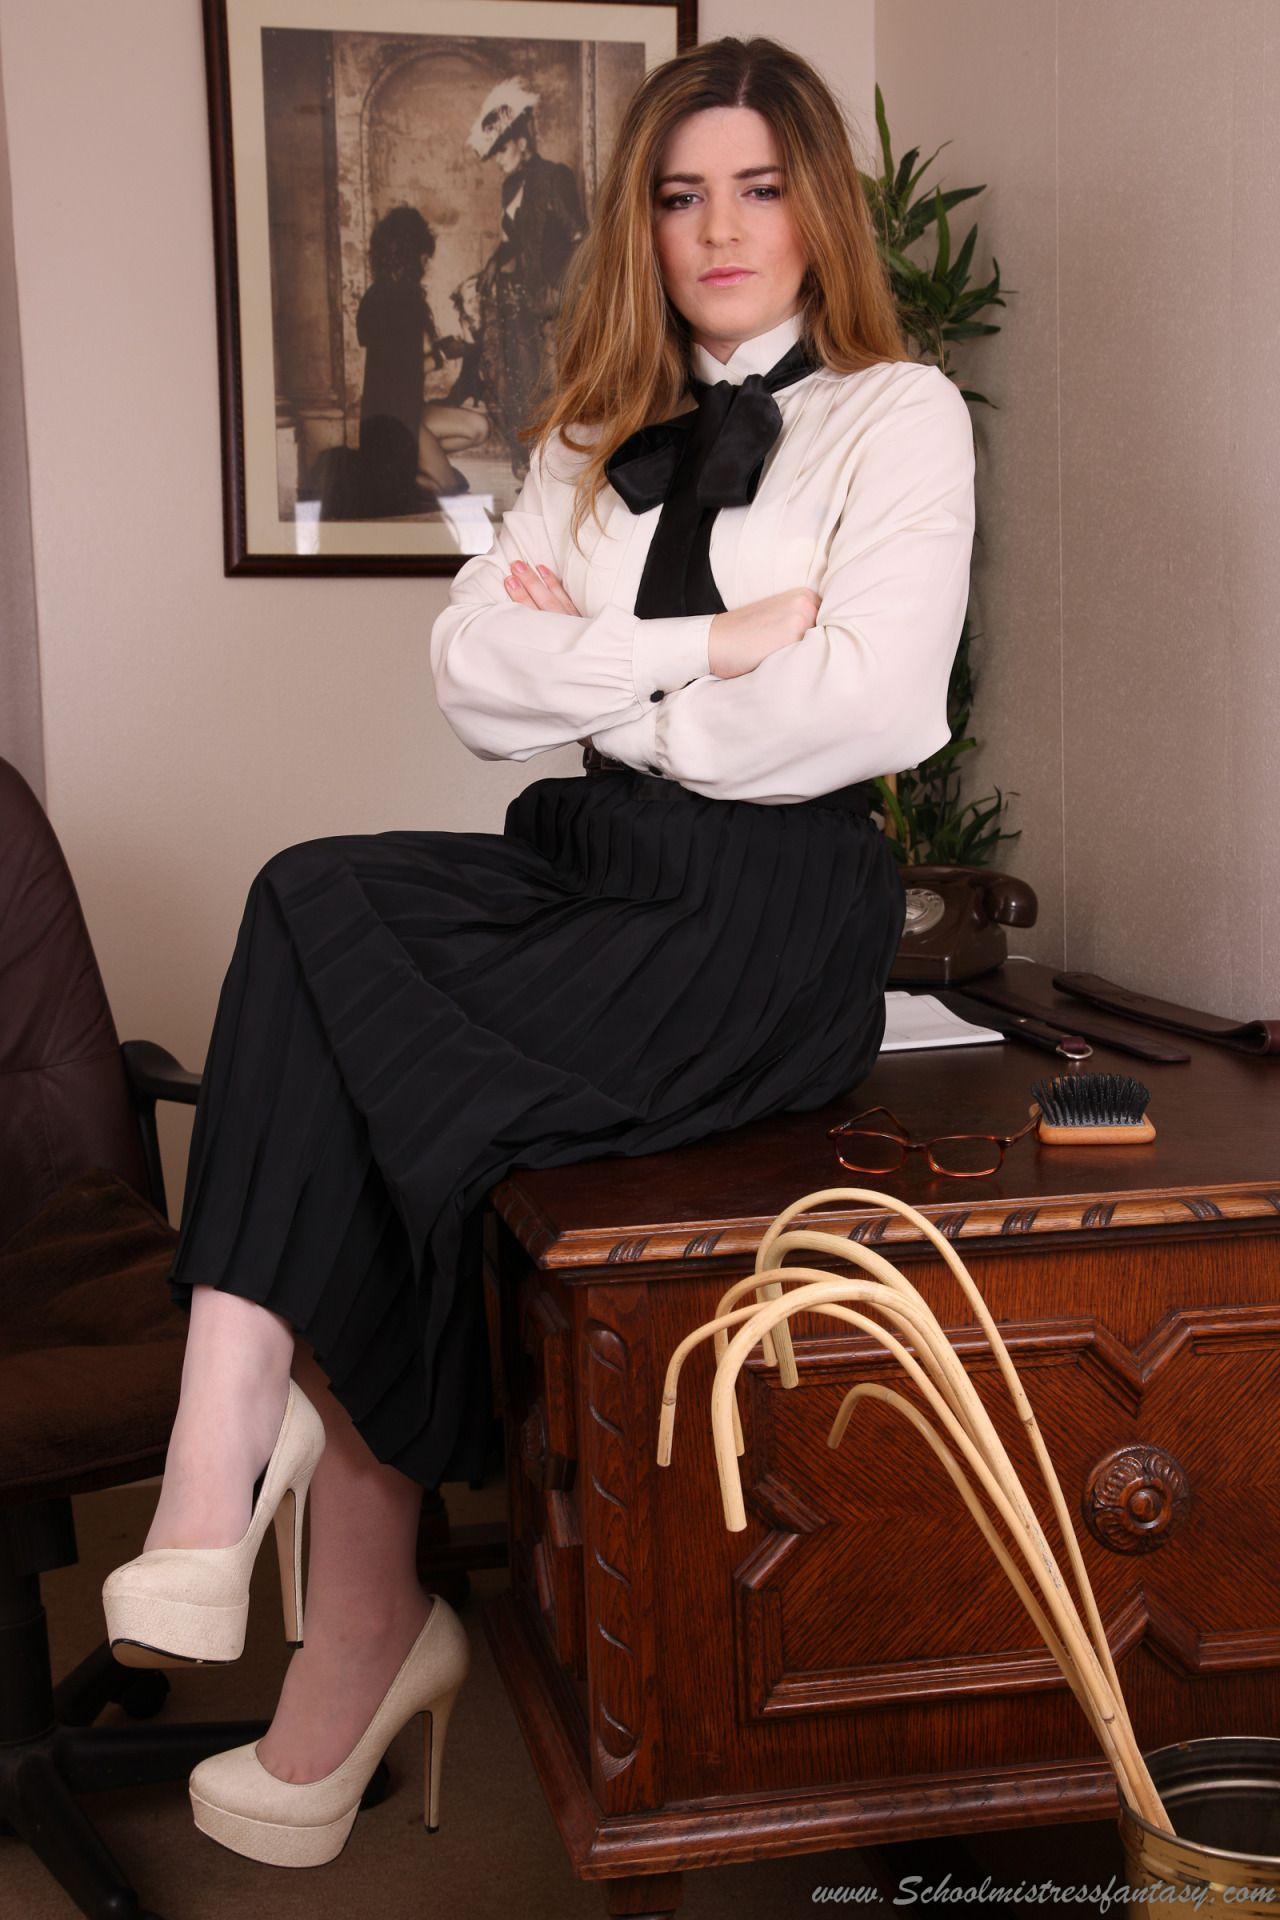 strict christian women - Google Search   Frau, Faltenrock